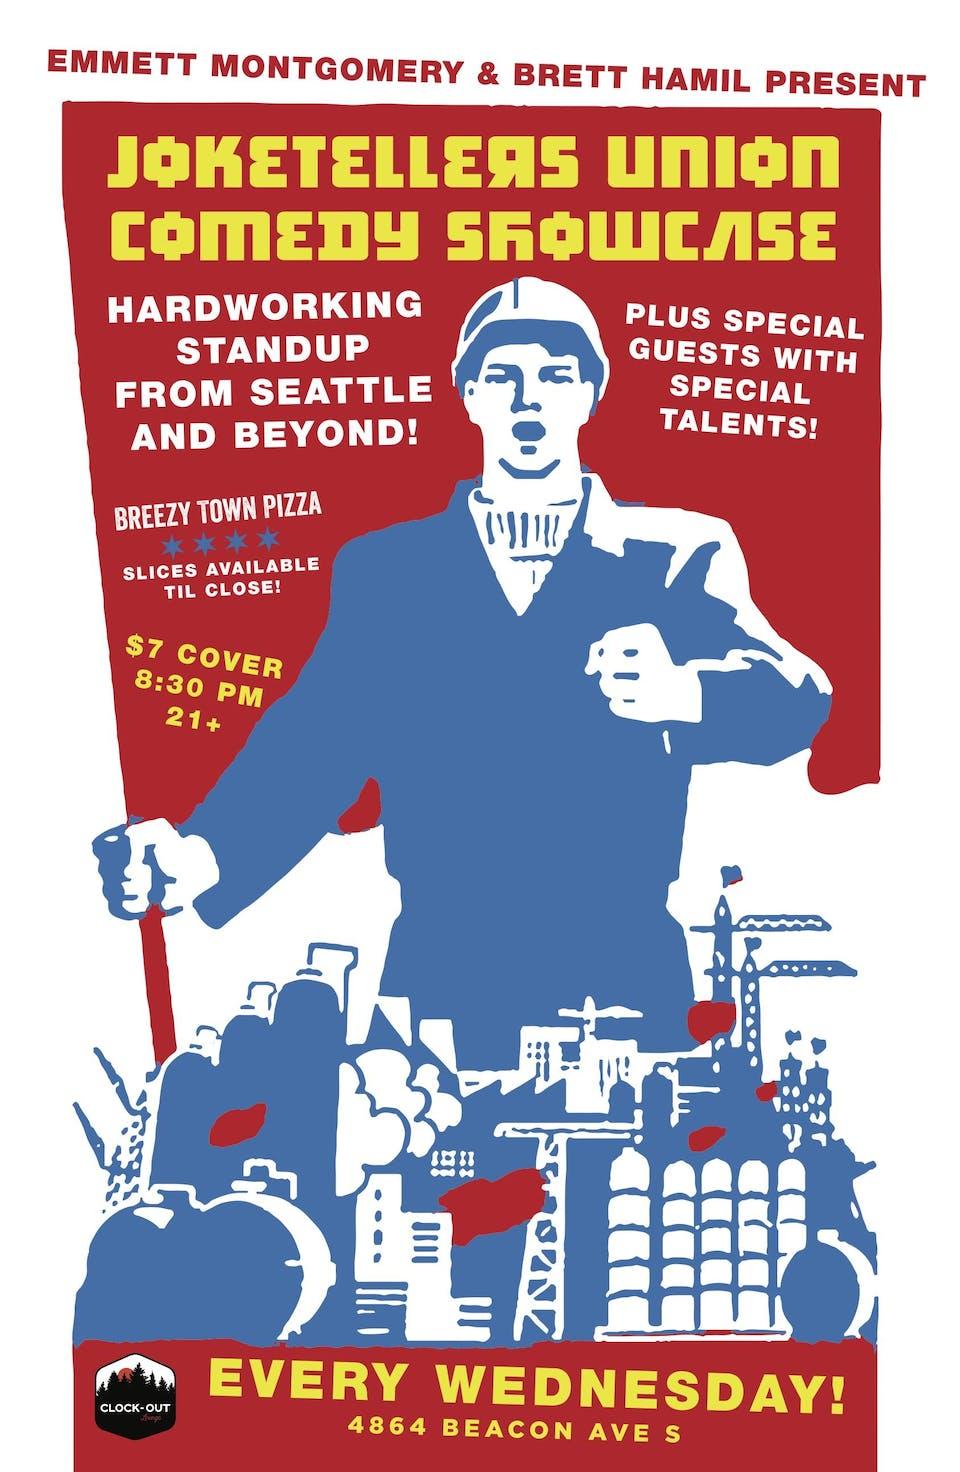 Joketellers Union Comedy Showcase